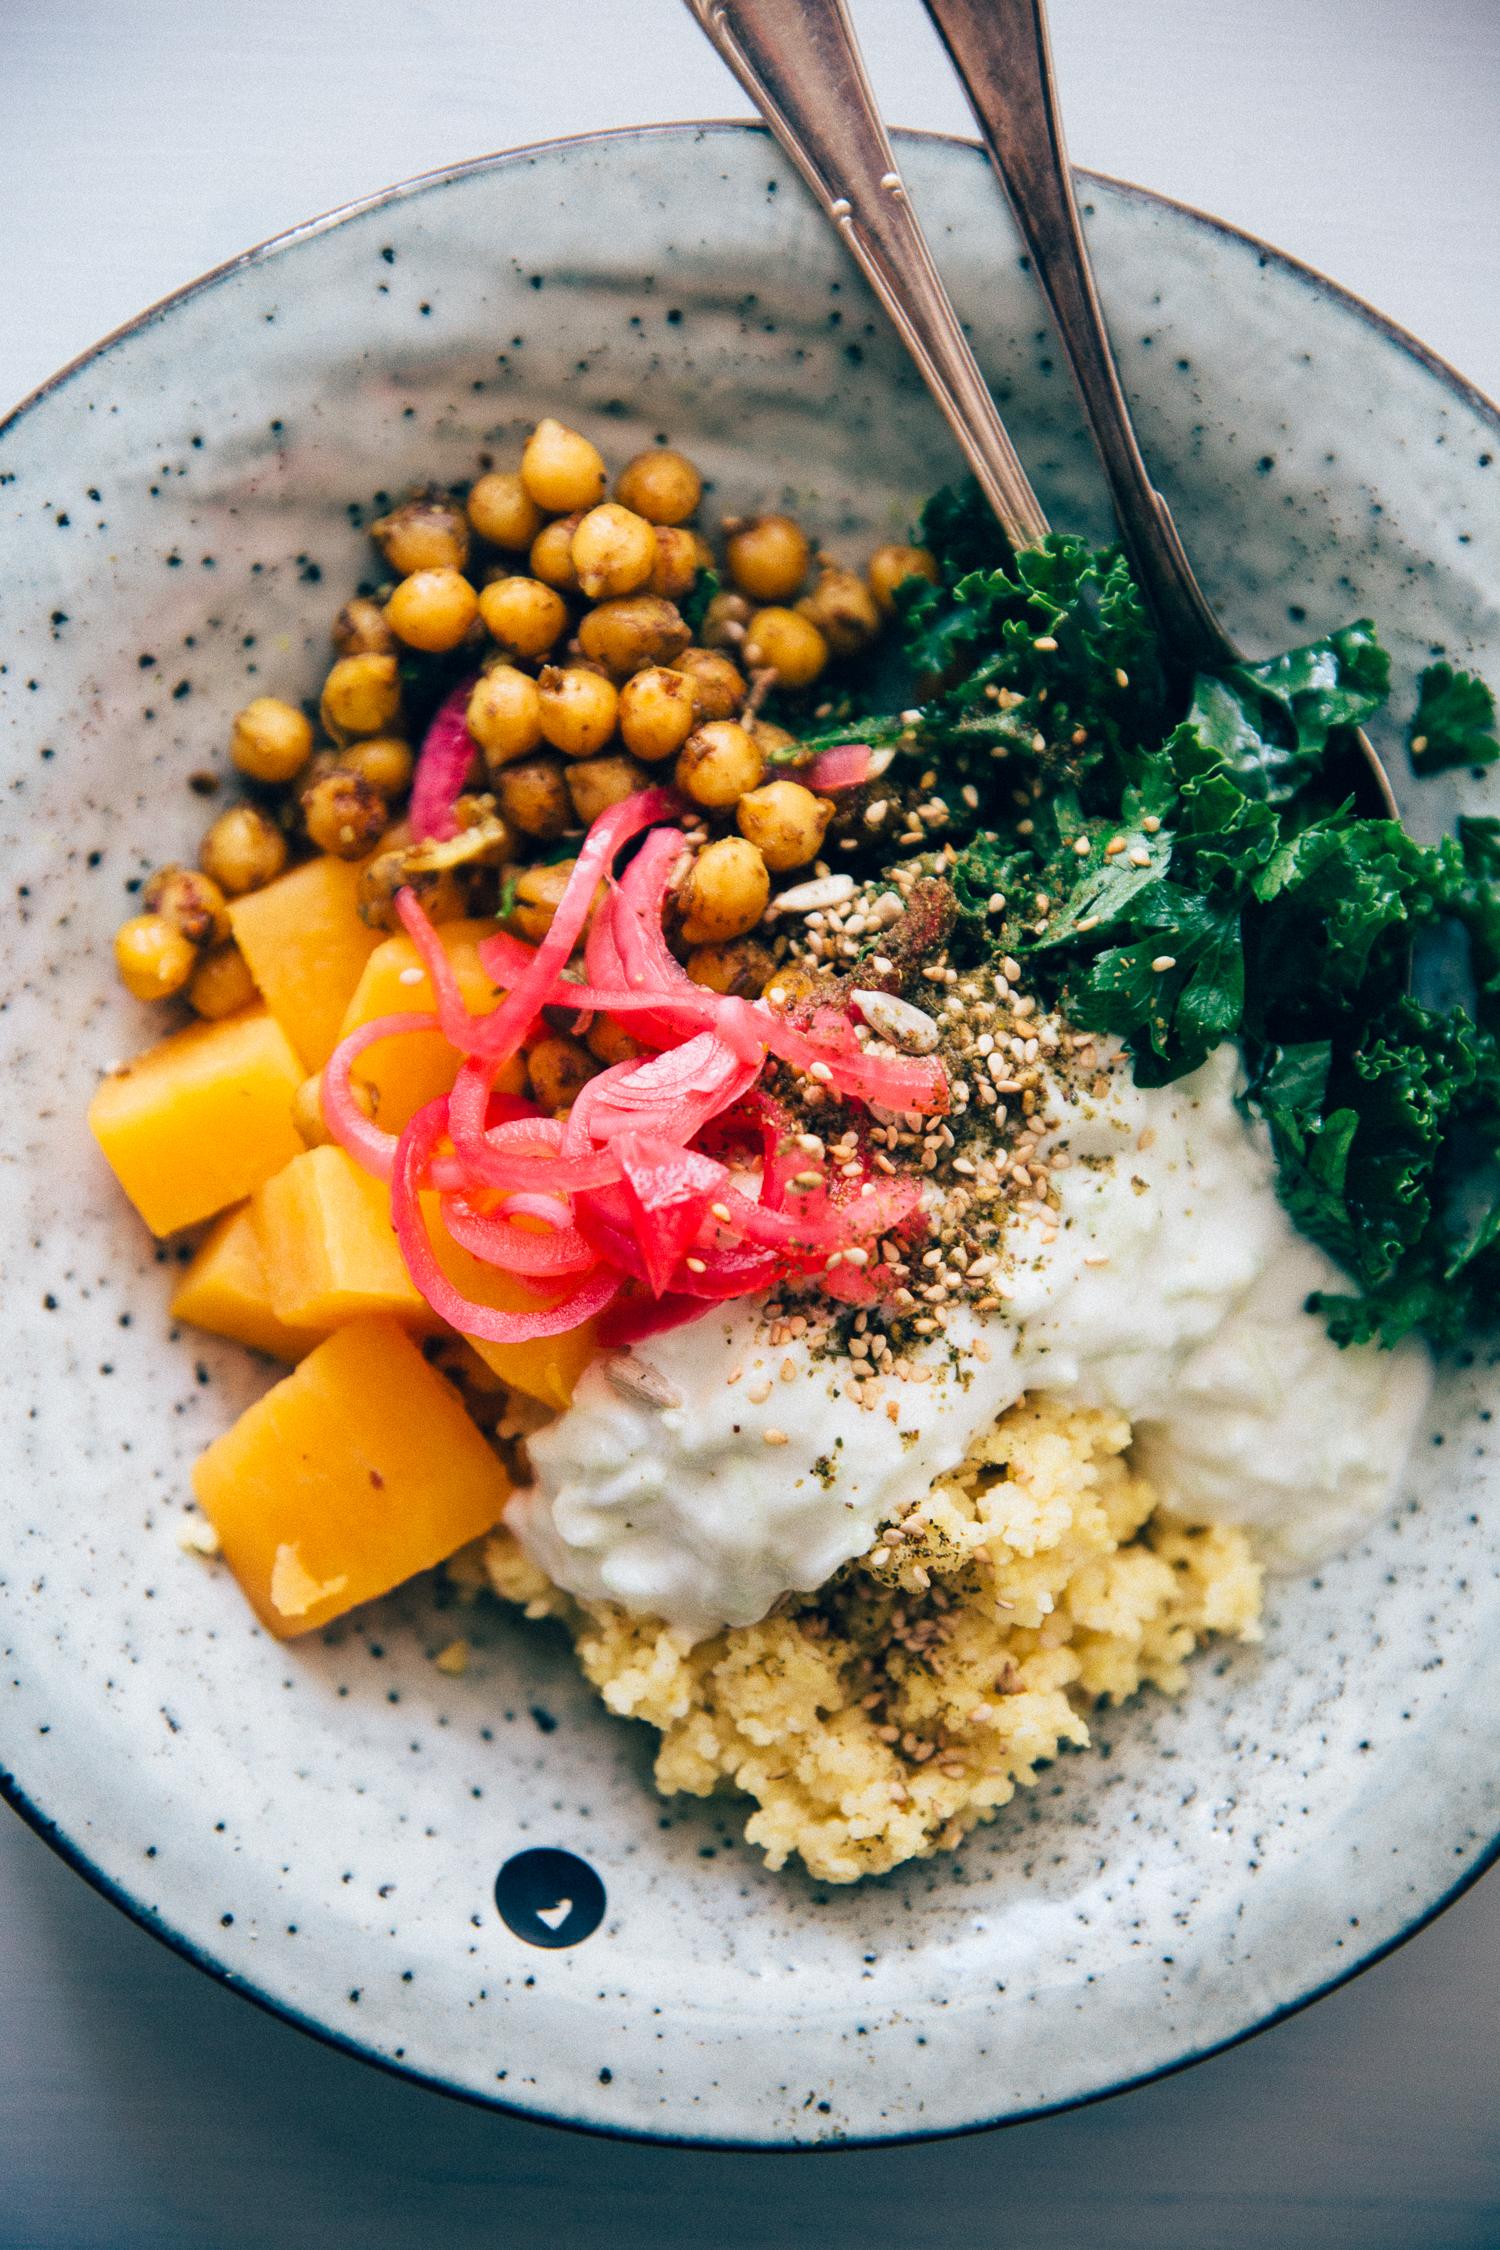 Hippie Bowl with Spicy Chickpea, Millet & Sweet Potato | Cashew Kitchen